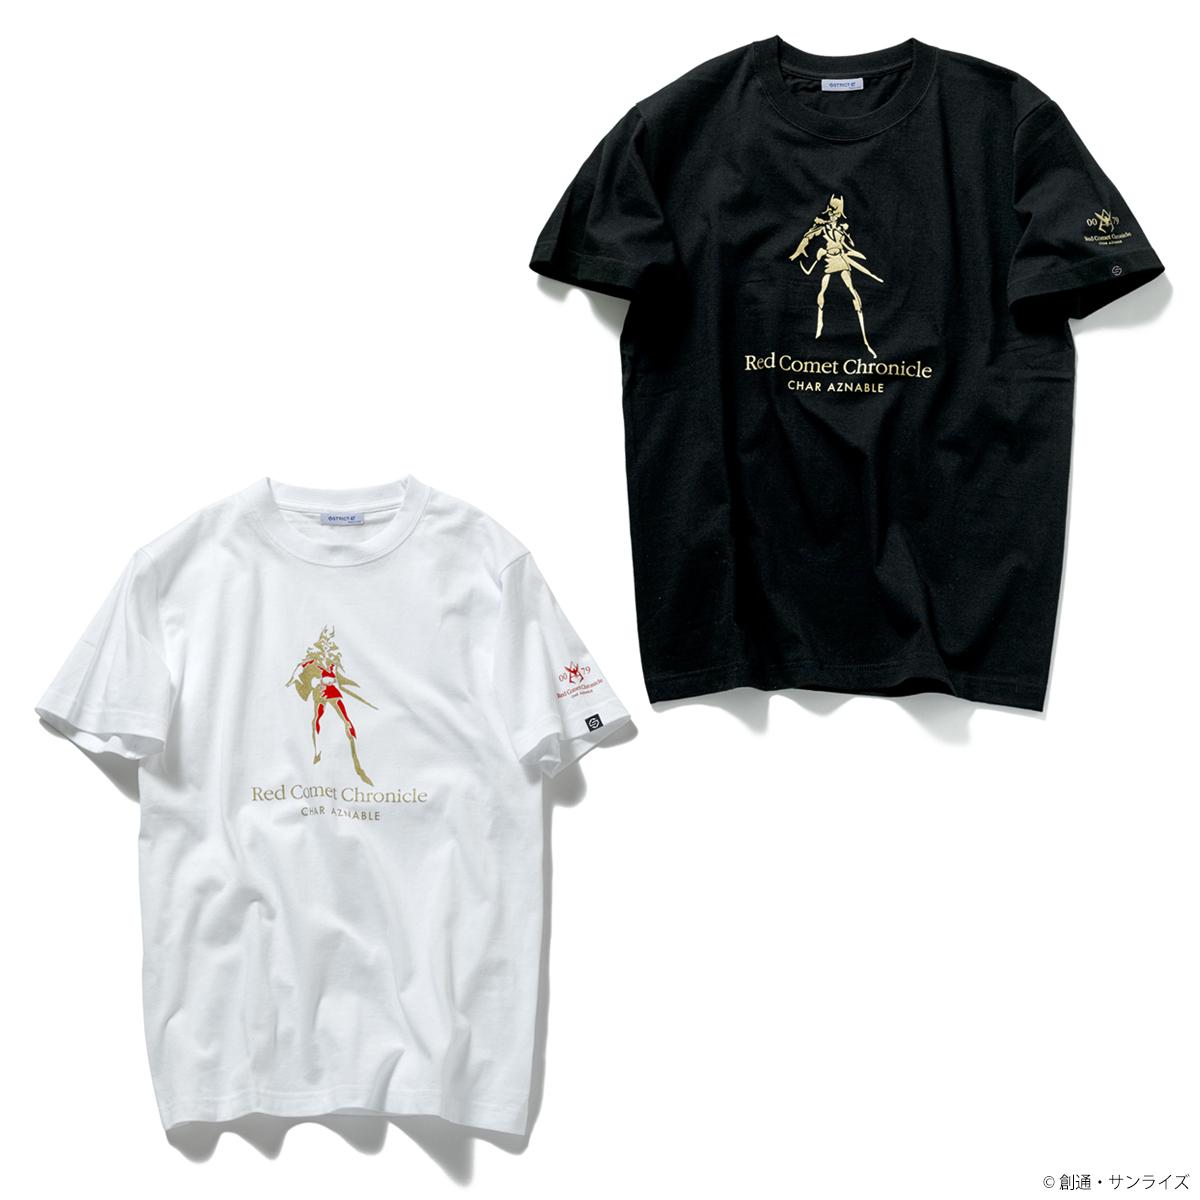 STRICT-G『機動戦士ガンダム』Red Comet Chronicle Tシャツ シャア・アズナブル